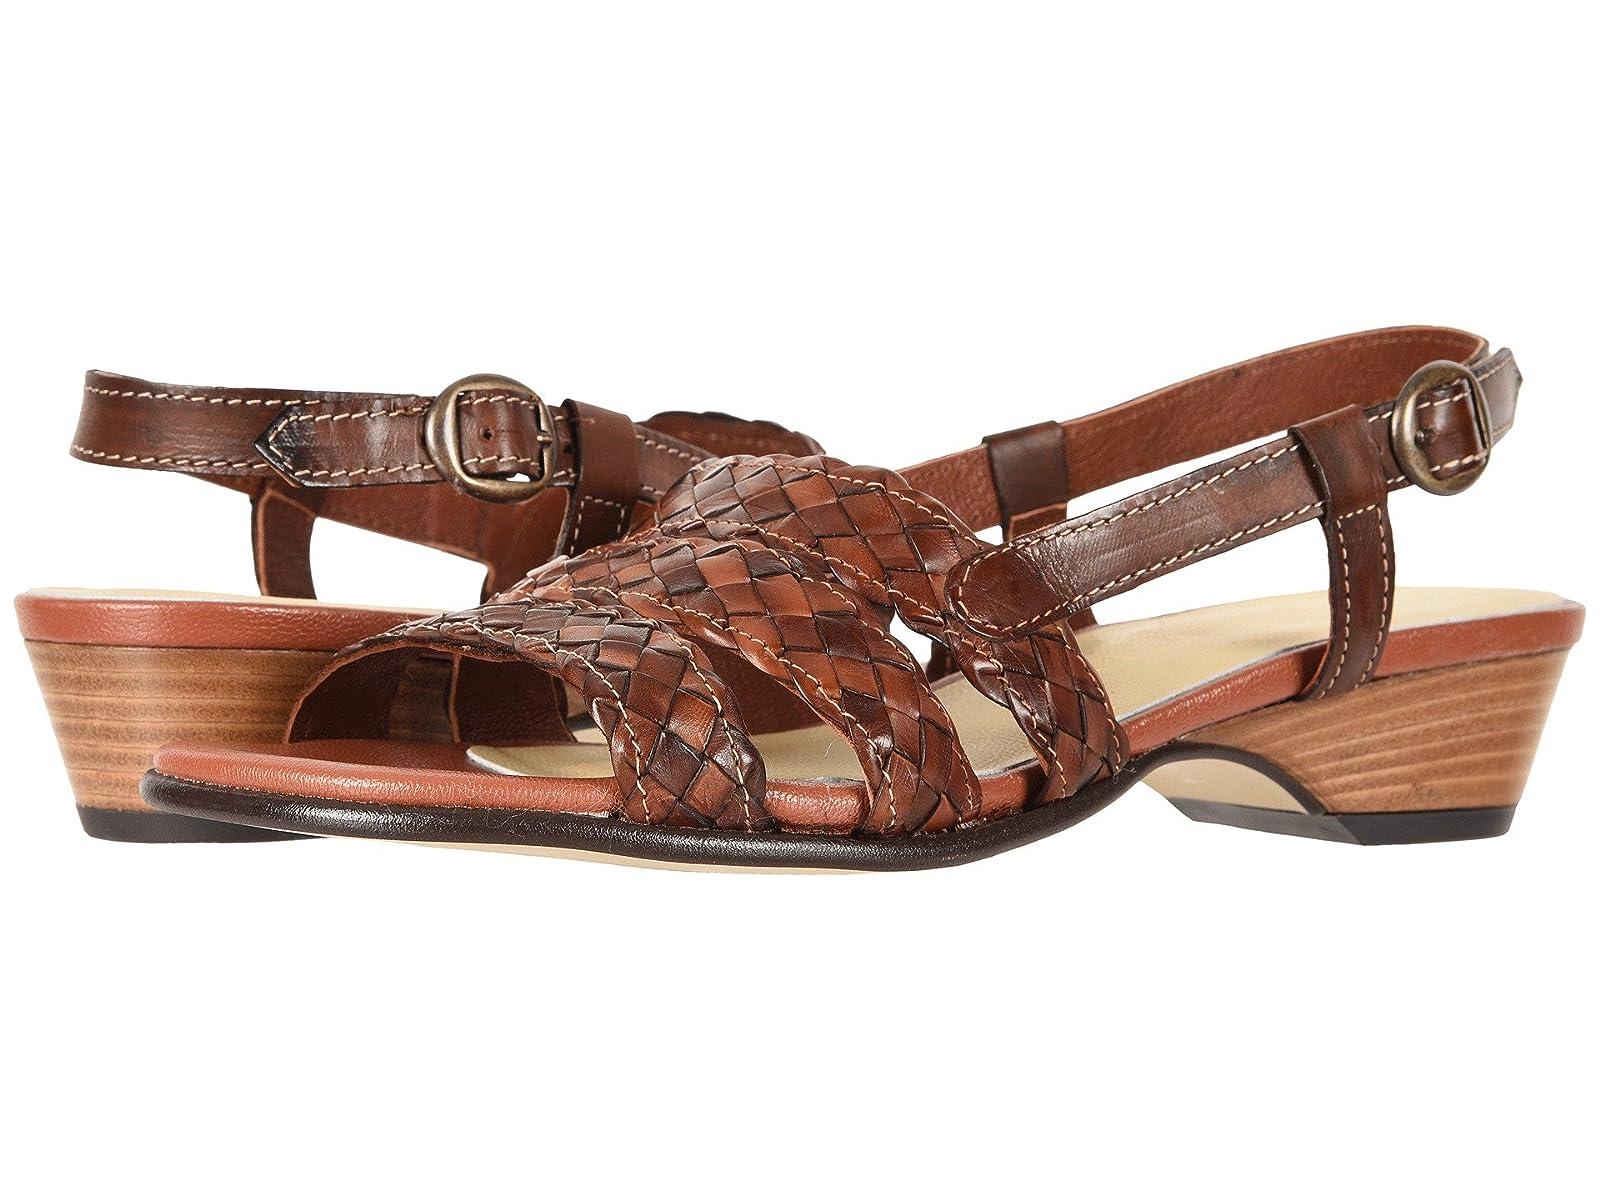 David Tate BellisimaComfortable and distinctive shoes